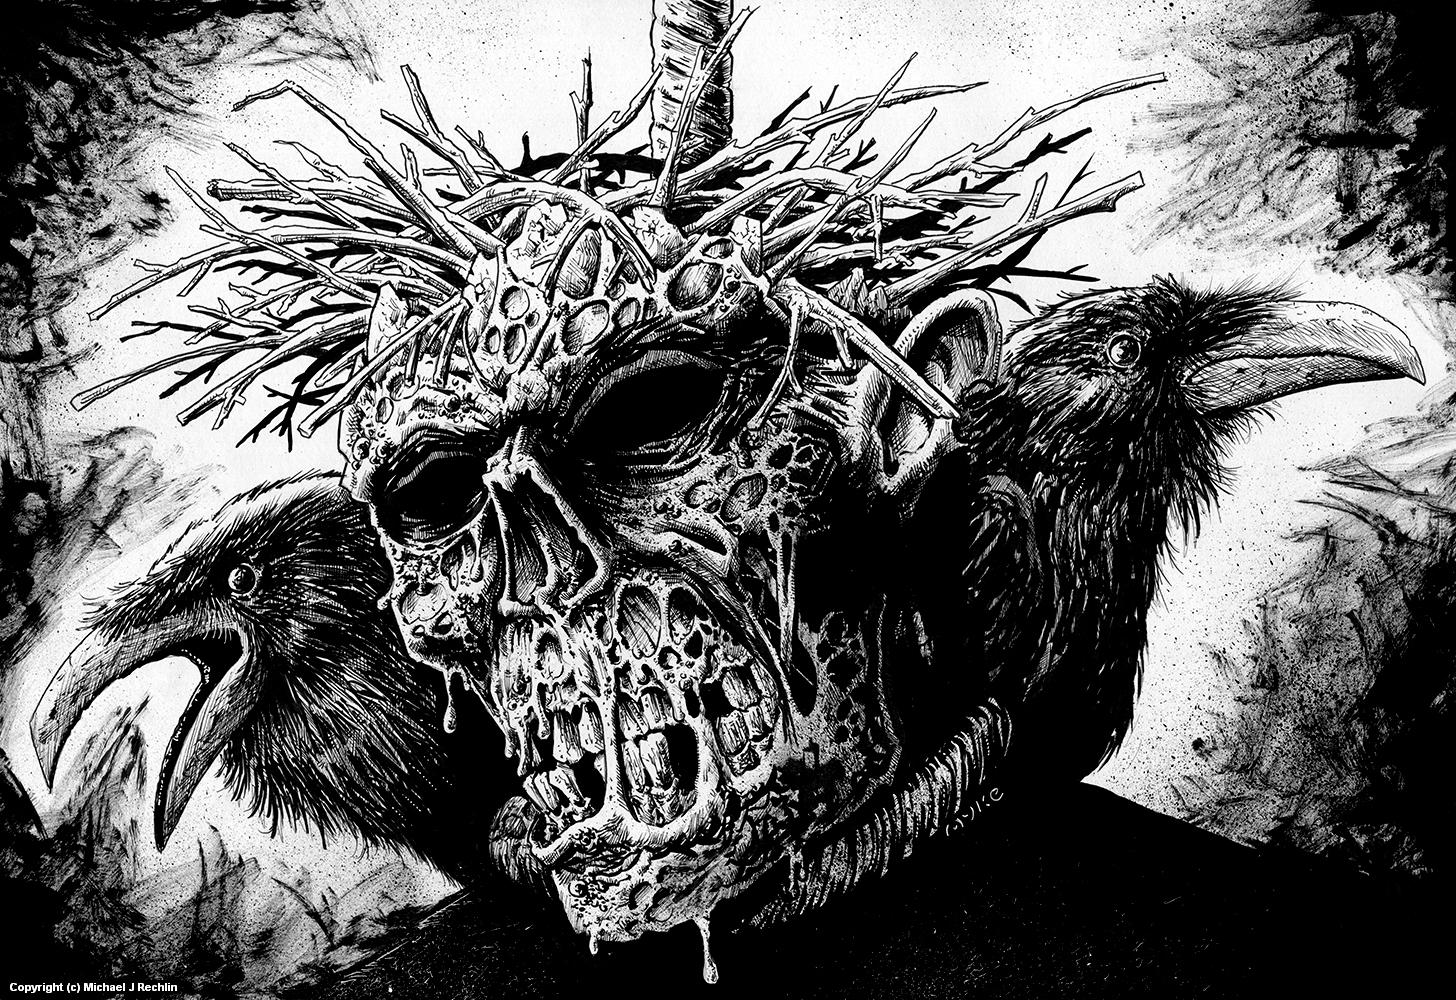 Worthless? Artwork by Michael Rechlin